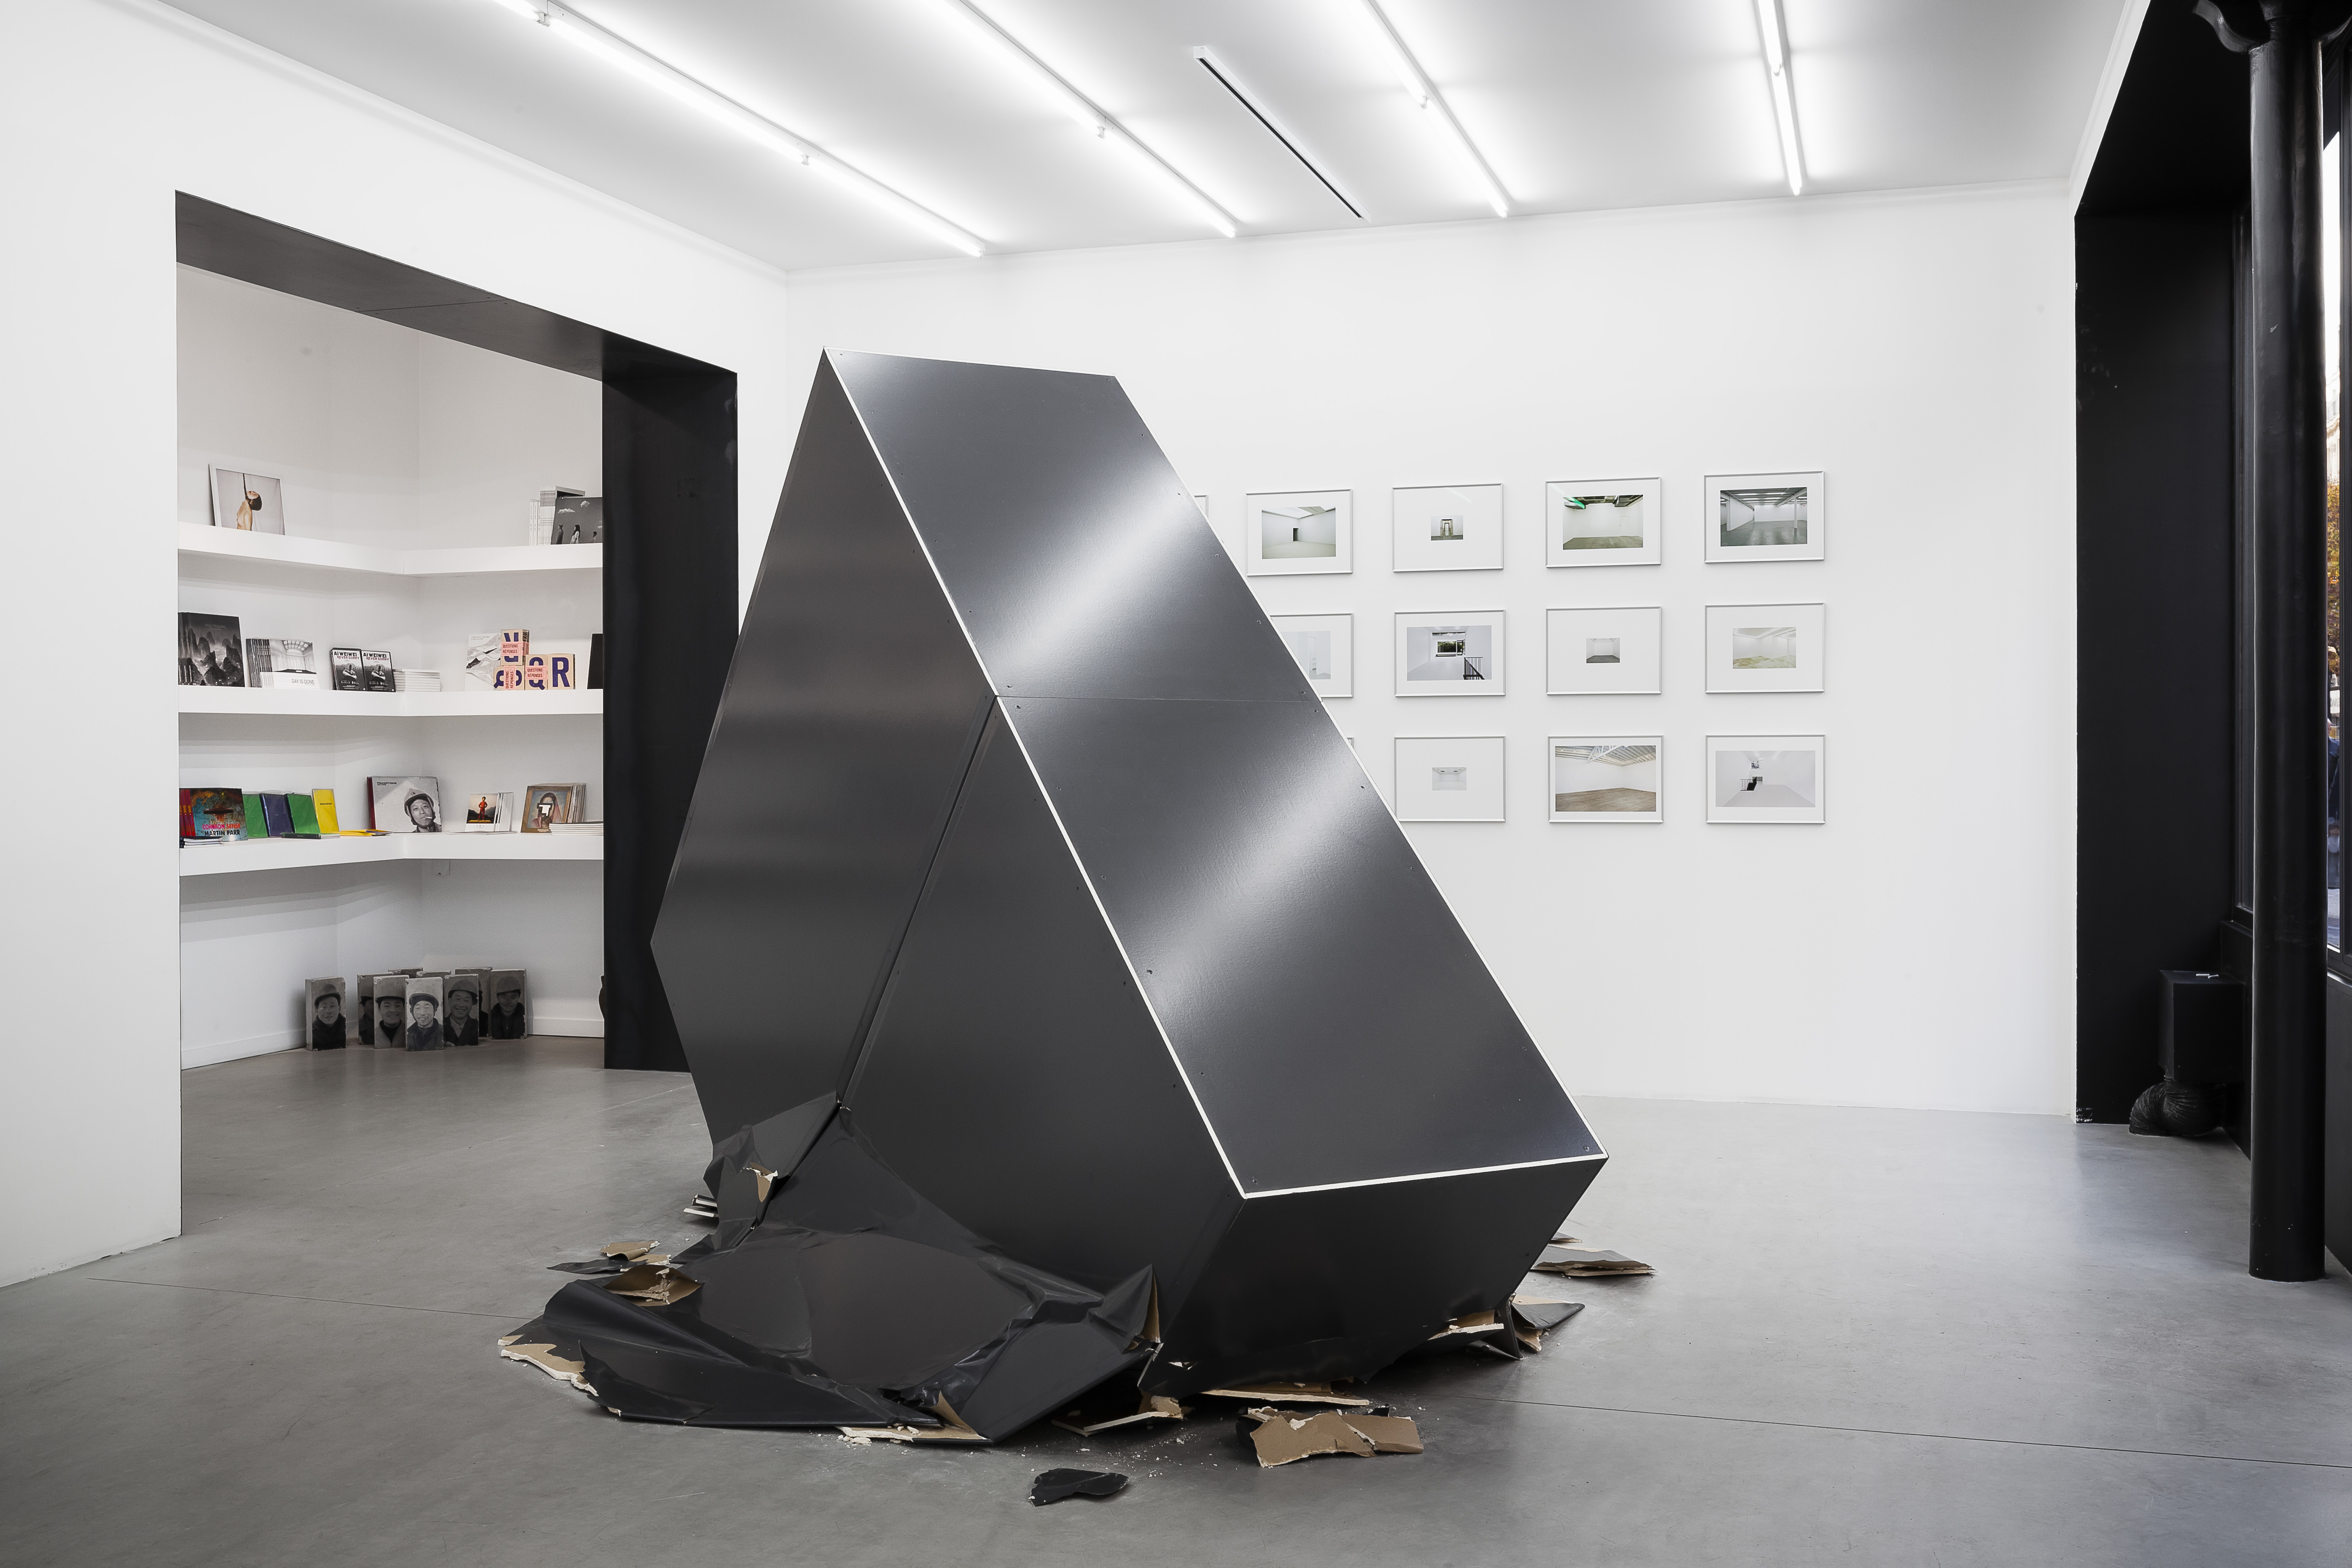 Photo : Théo Baulig. Courtesy of Galerie Paris-Beijing.